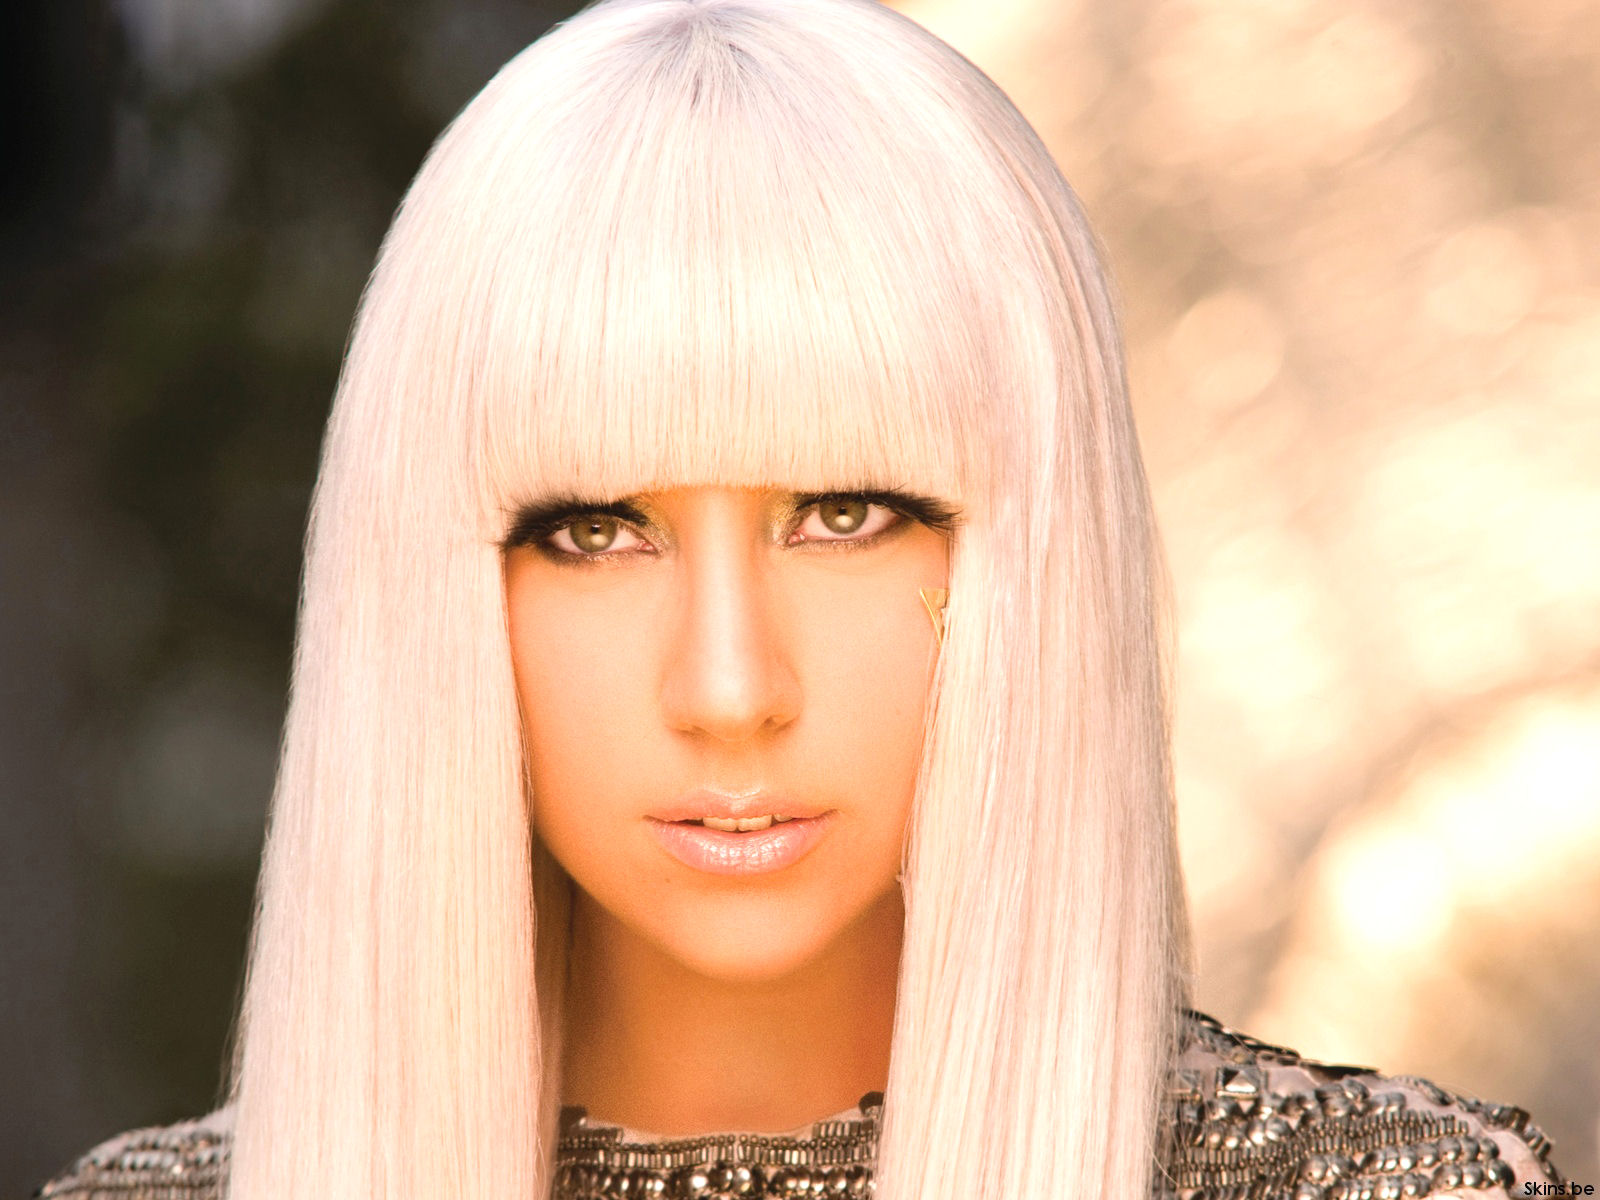 http://2.bp.blogspot.com/-r-yp4HB-6wk/T_qjHOikpoI/AAAAAAAAKFo/UTtWGV0f1ZY/s1600/Las+Mejores+Fotos+De+Lady+Gaga,Wallpapers++%282%29.jpg